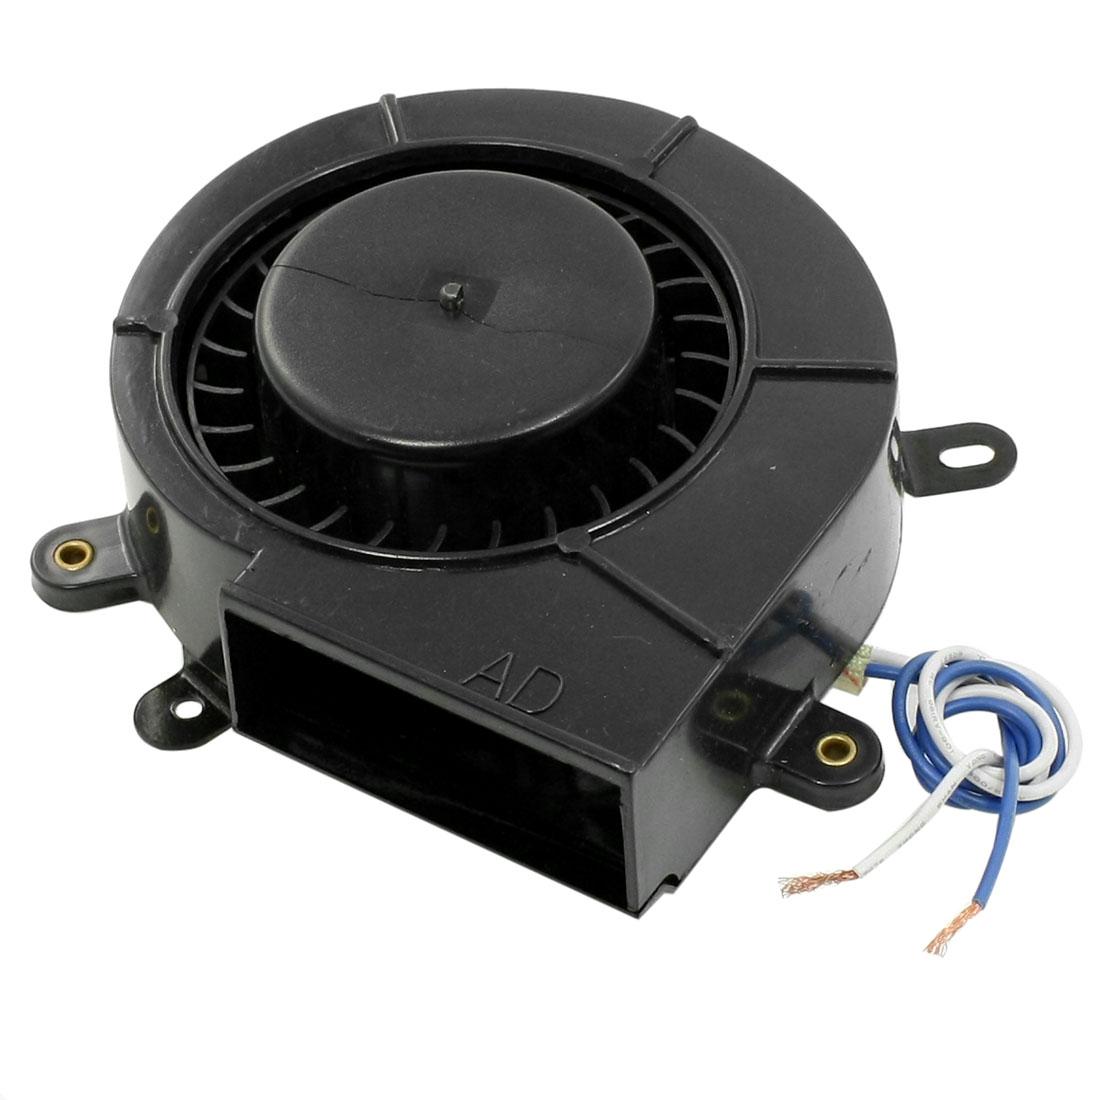 Black Metallic Housing Snail Shape Heater Blower Motor AC 110V 10W 2400RPM